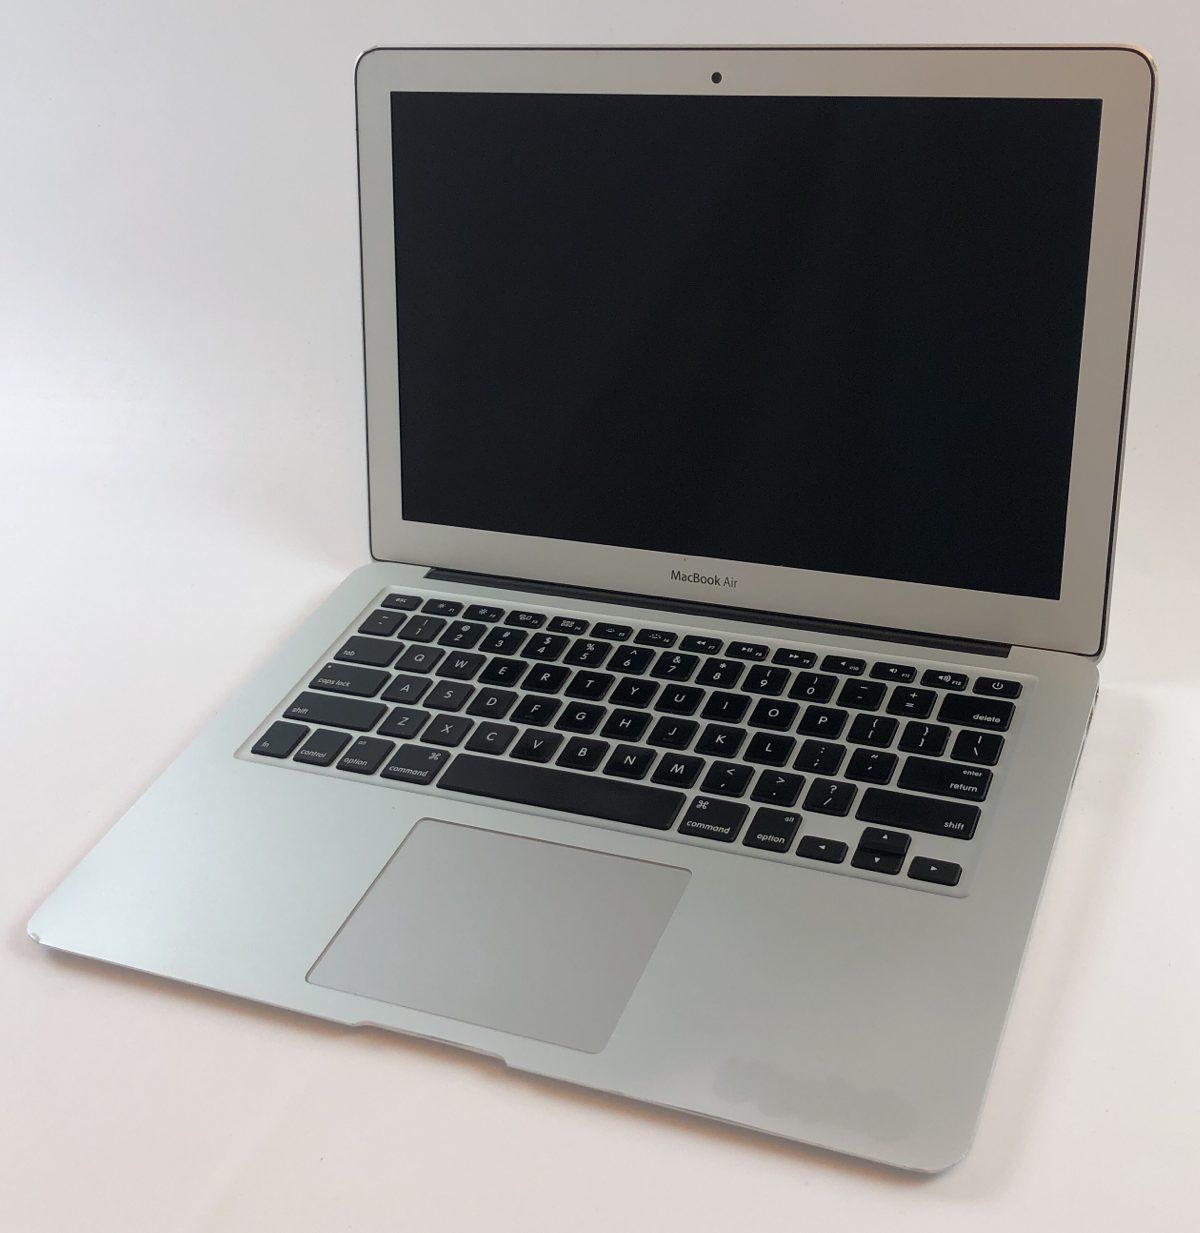 "MacBook Air 13"" Early 2014 (Intel Core i7 1.7 GHz 8 GB RAM 256 GB SSD), Intel Core i7 1.7 GHz, 8 GB RAM, 256 GB SSD, image 1"